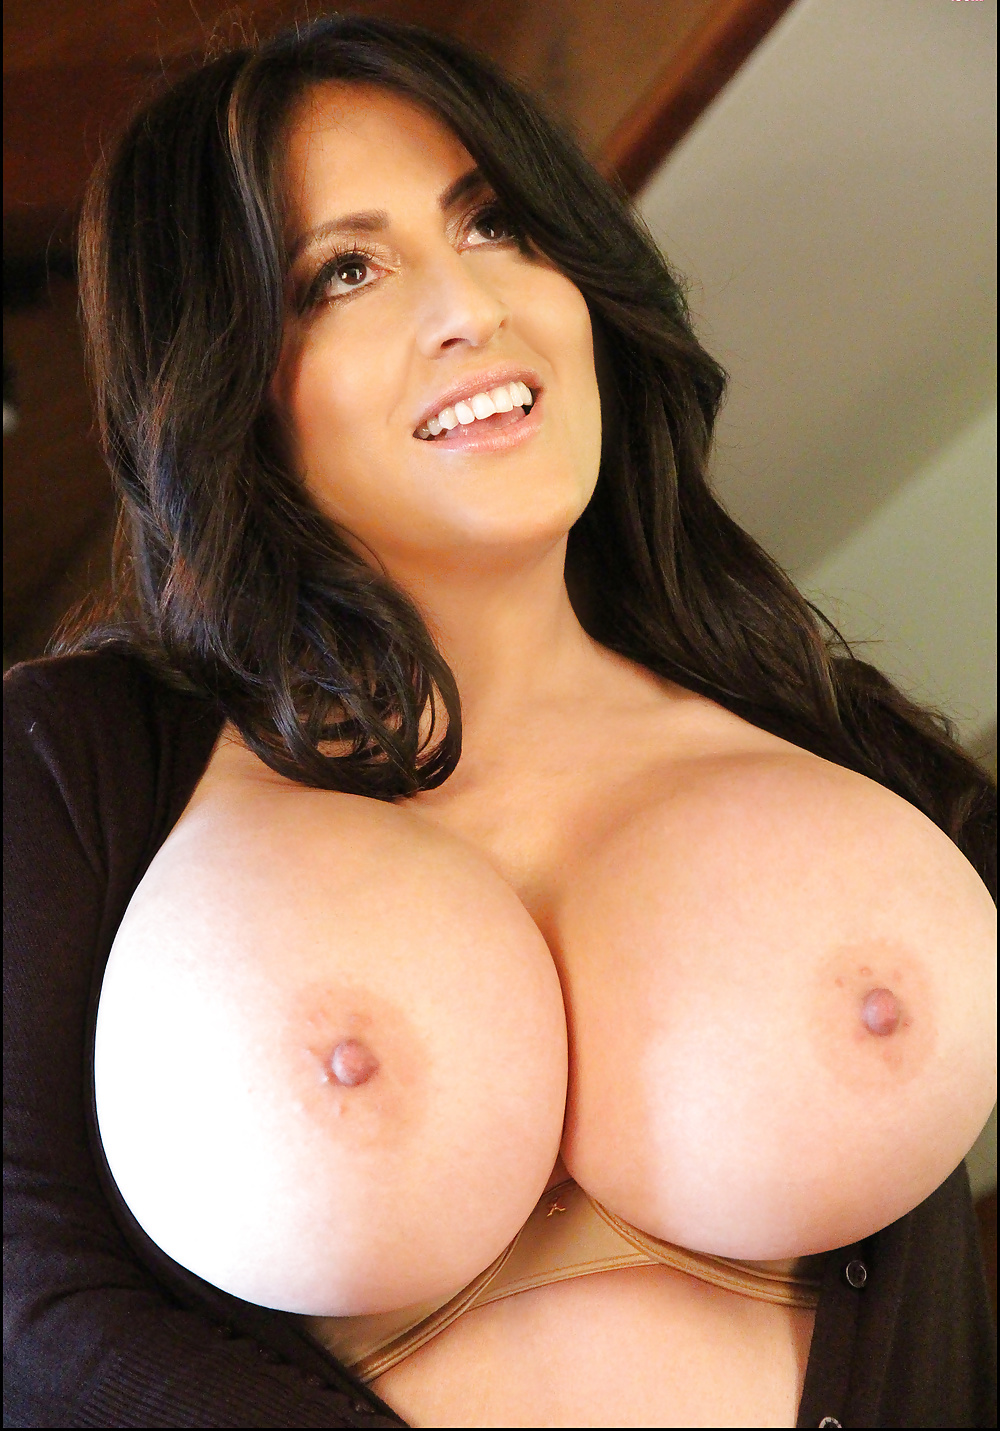 Big tits round address